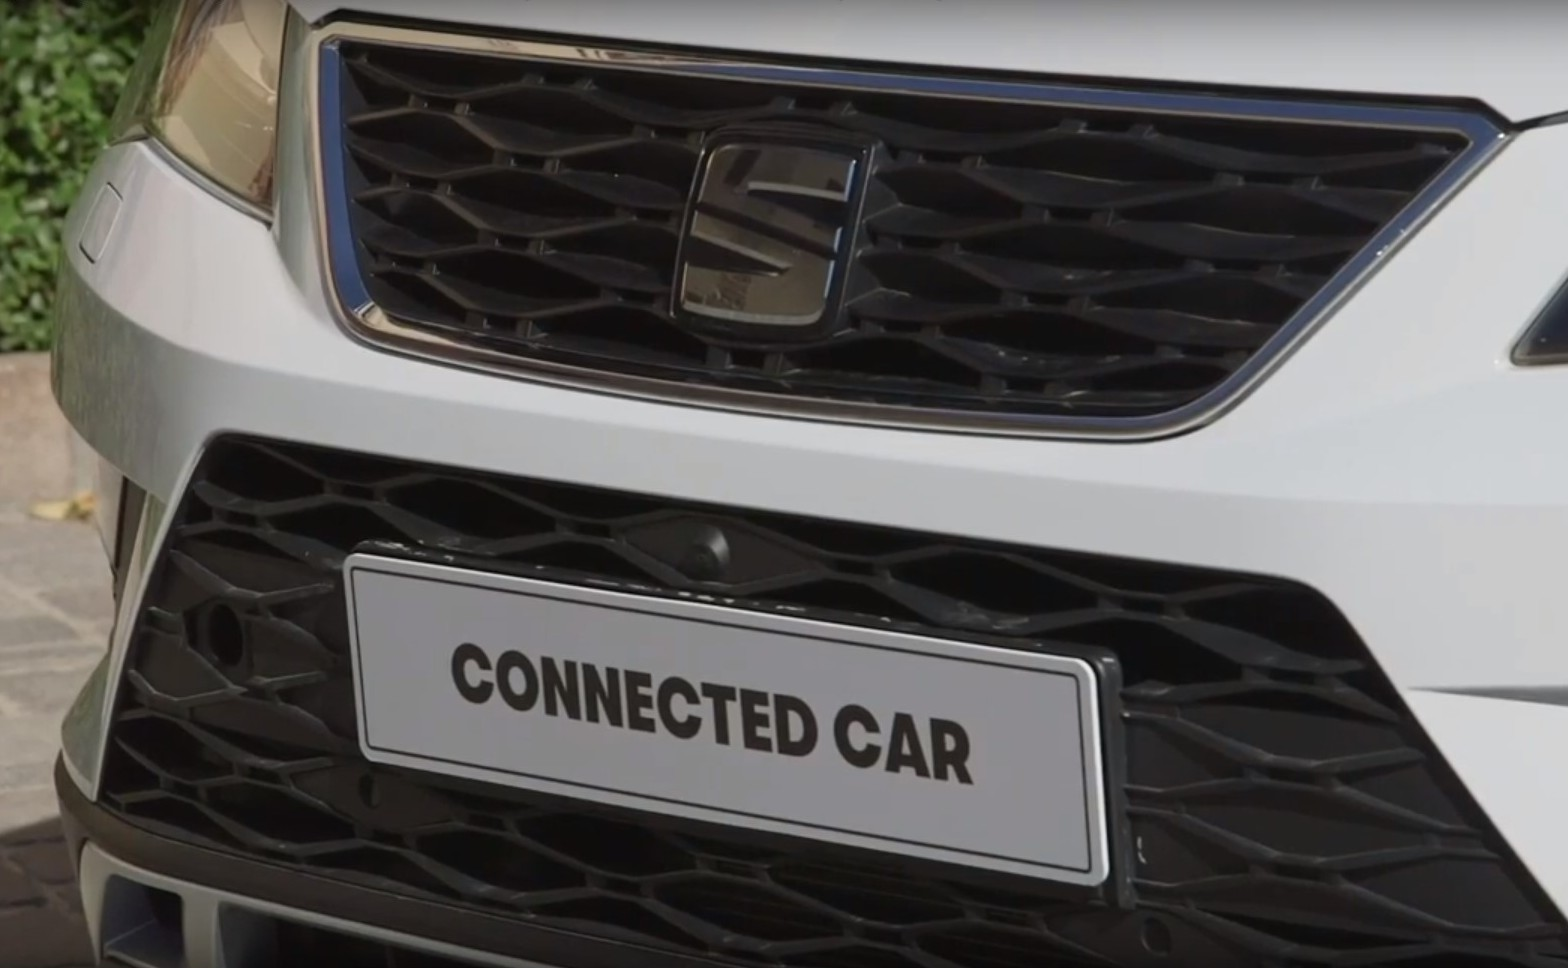 Seat na MWC u Barceloni predstavlja 5G Connected Car